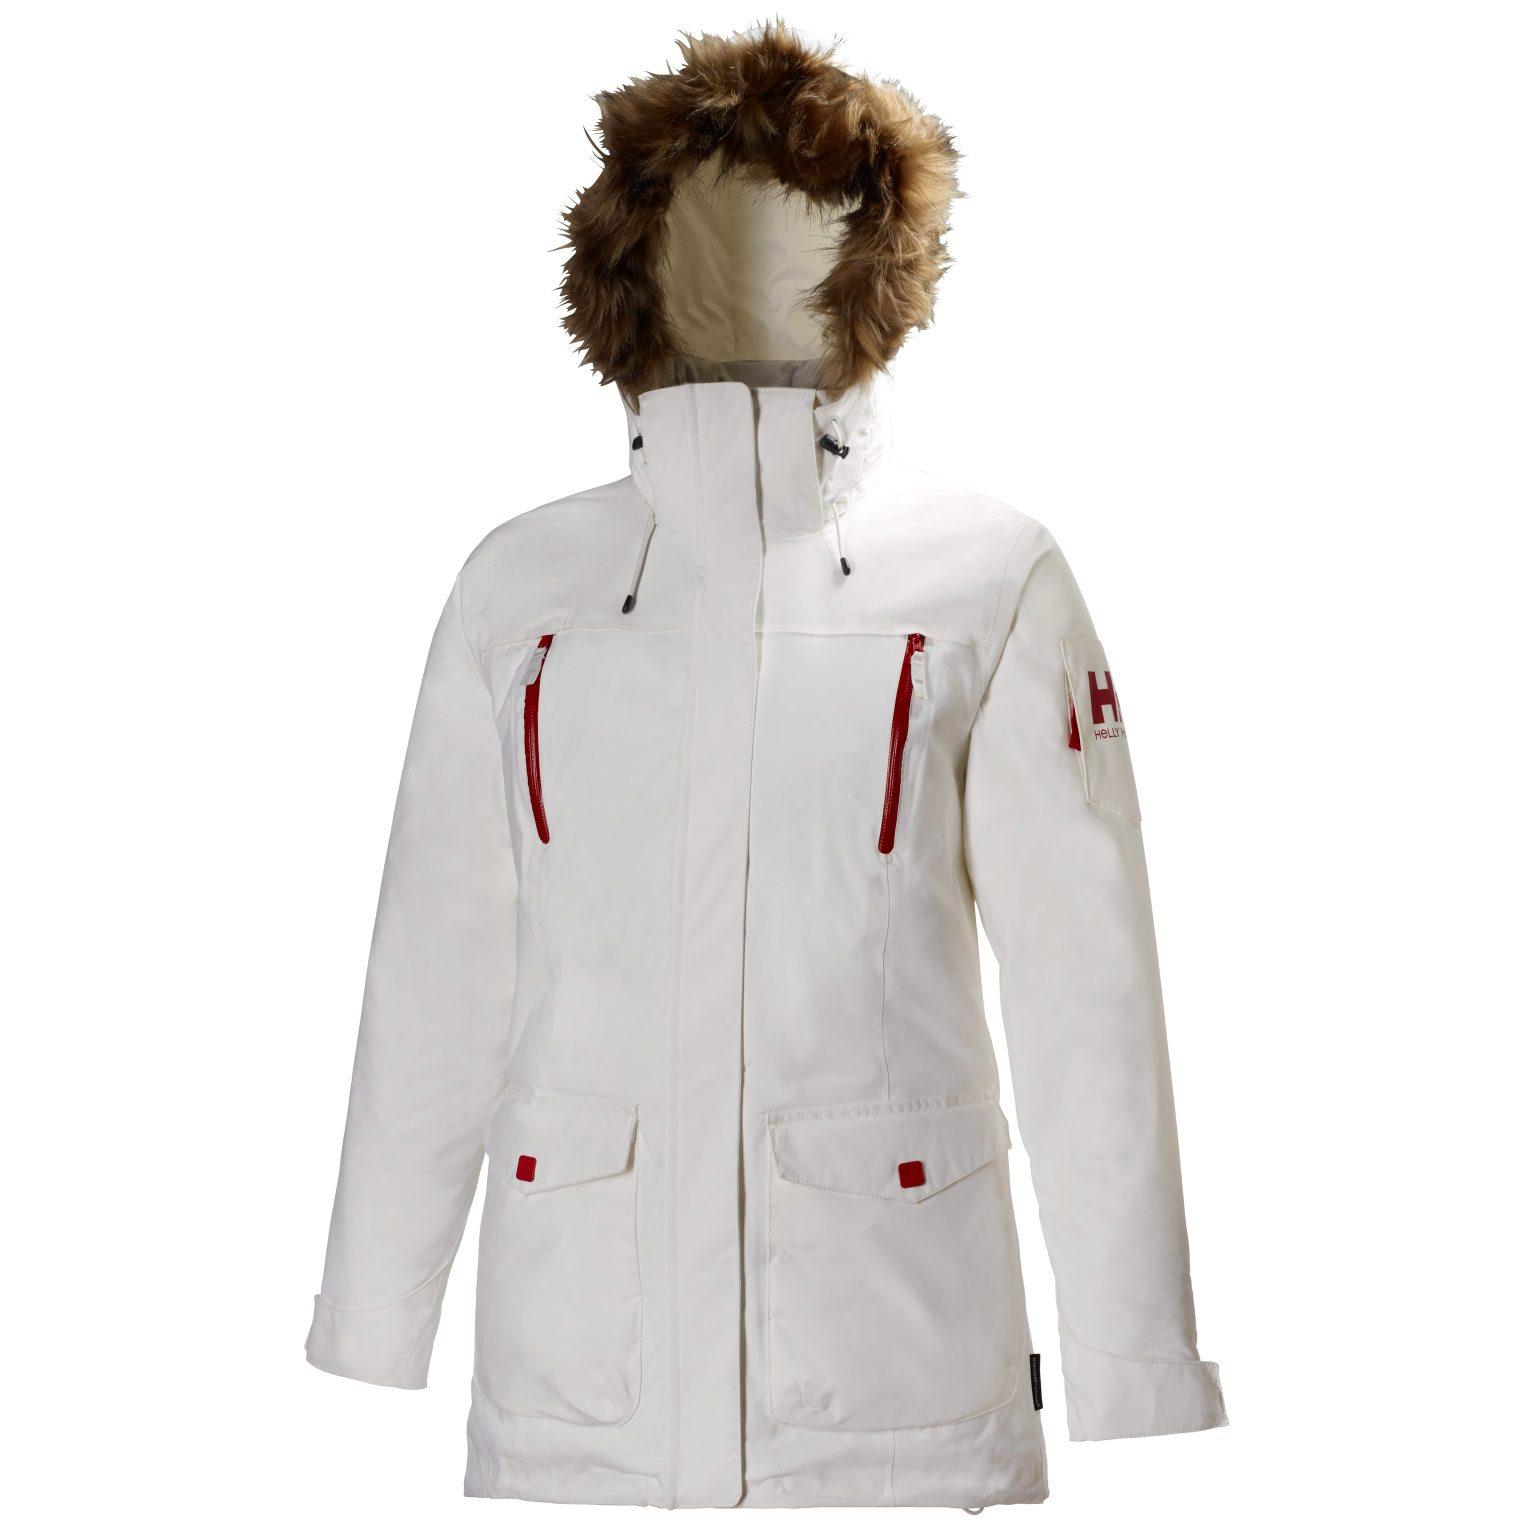 Helly Hansen Jacket.jpg